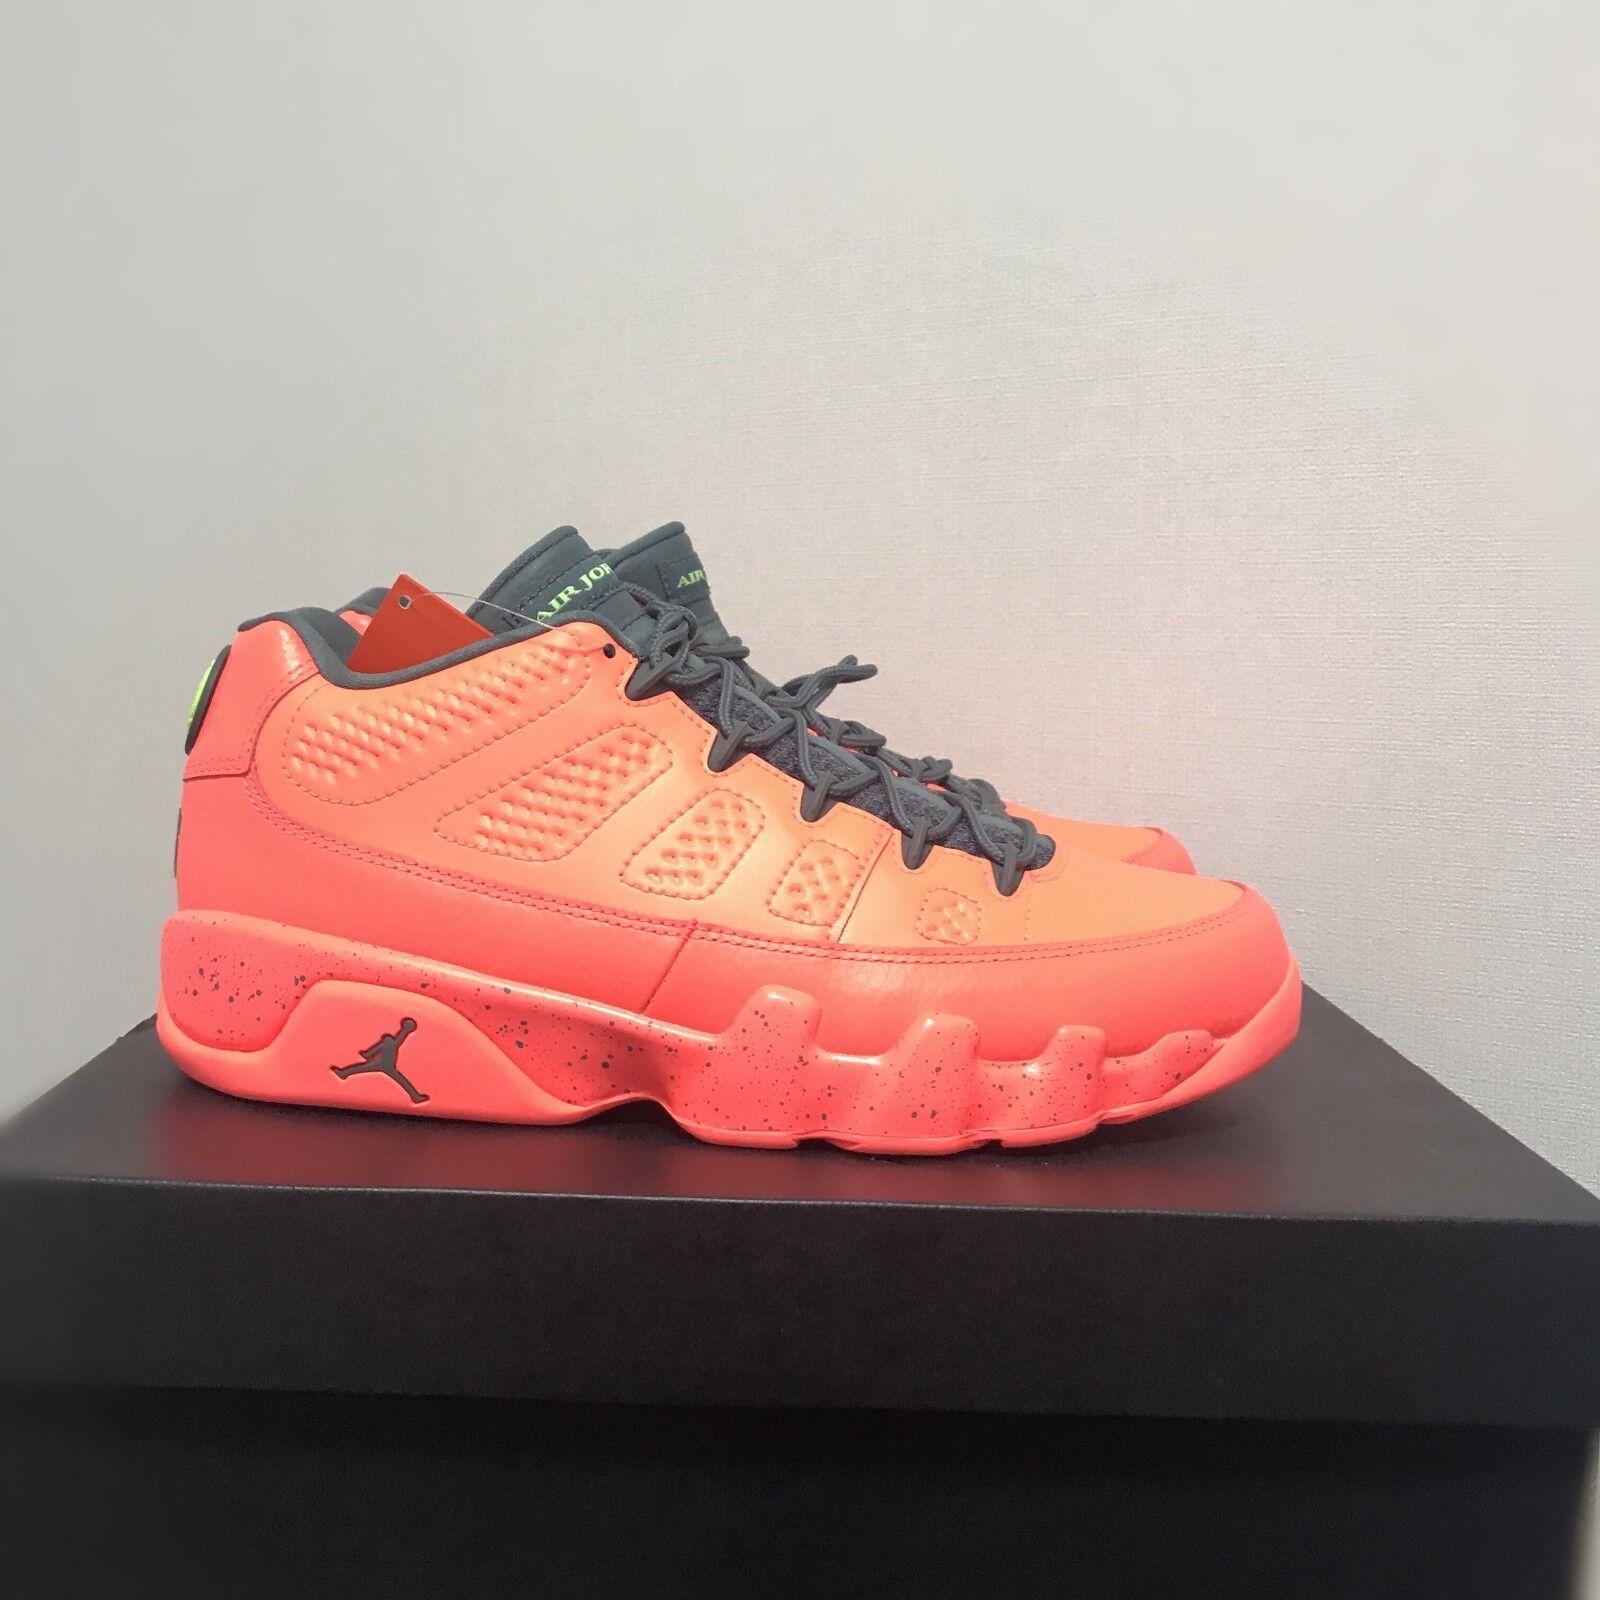 cd283edd6f3976 Air Jordan 9 Retro Low Shoes 832822-805 Bright Mango Size 8-10 Limited.    Limited quantity  . black